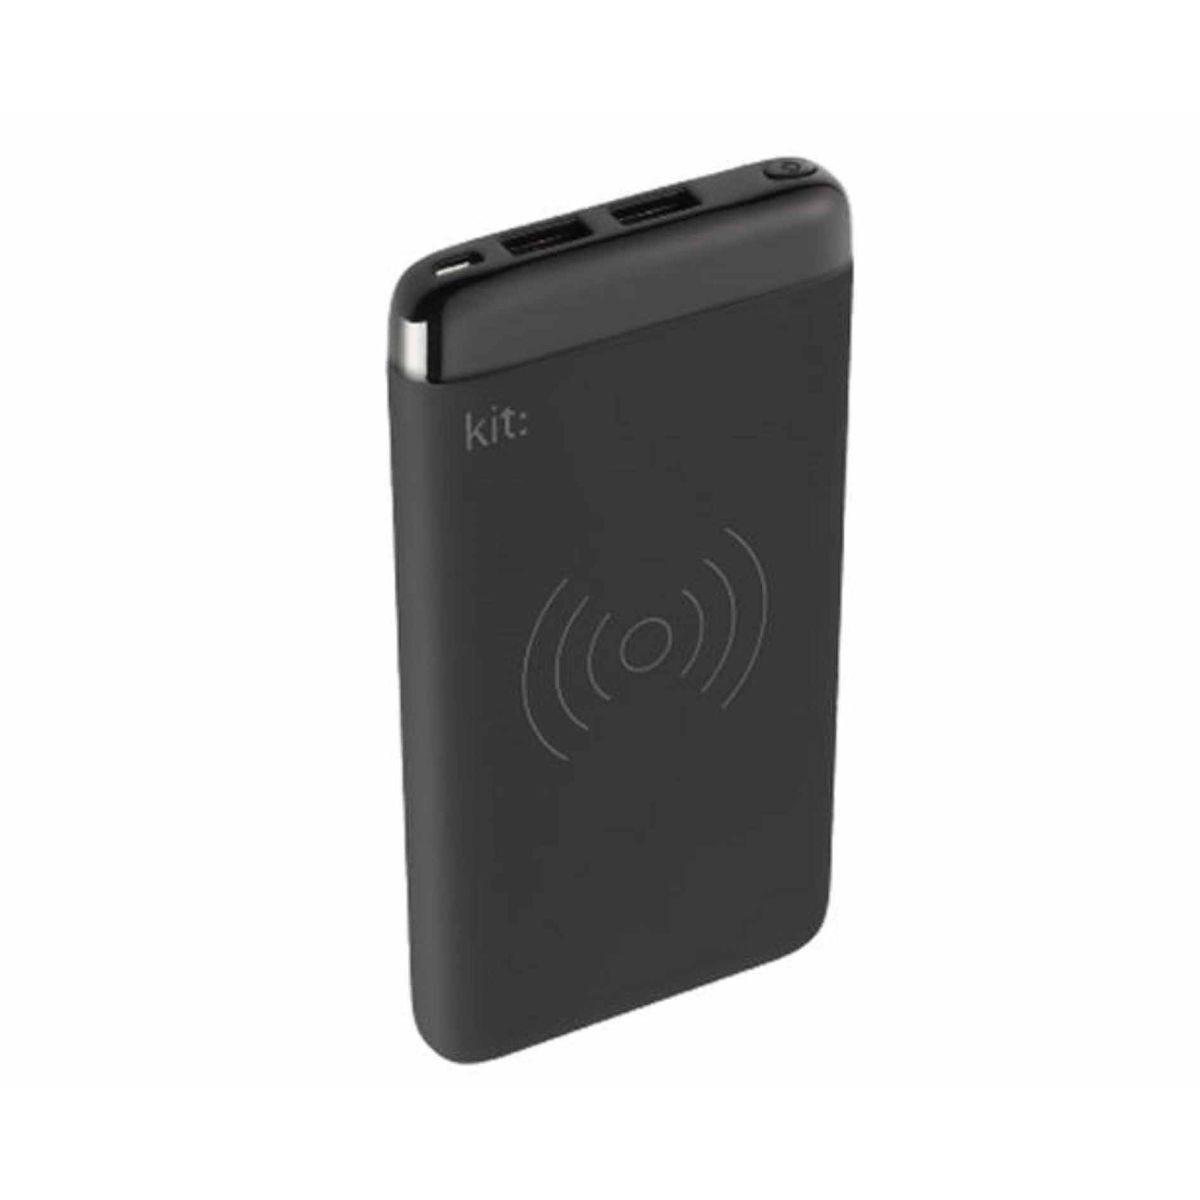 Kit Wireless Power Bank 5000mAh